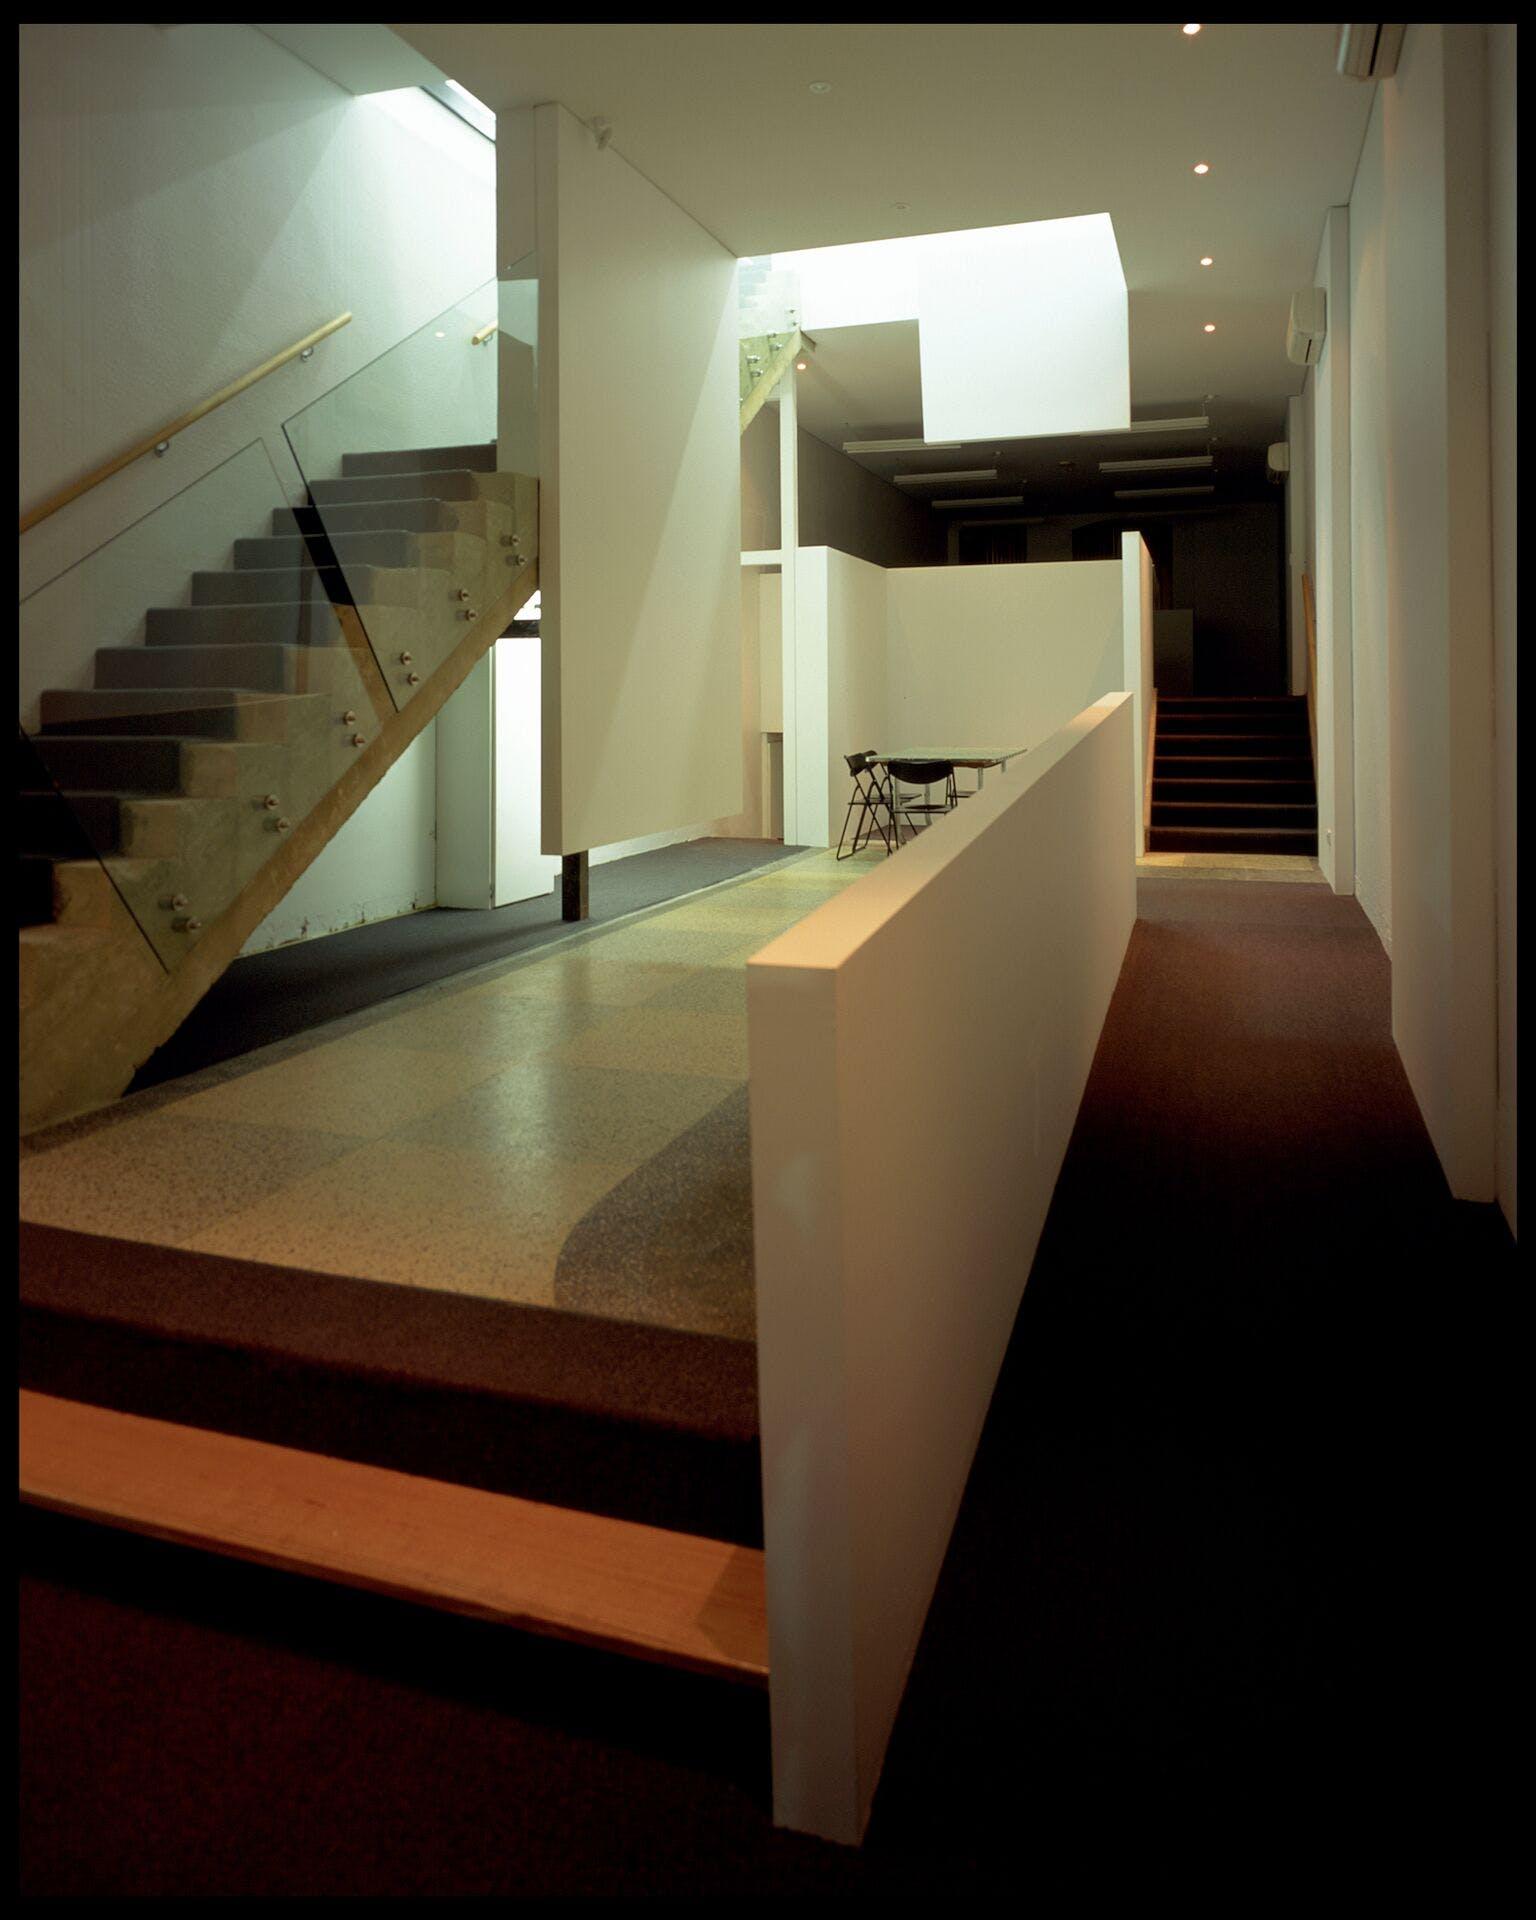 Mezzanine Area, multi-use area at Flightpath Architects, image 1